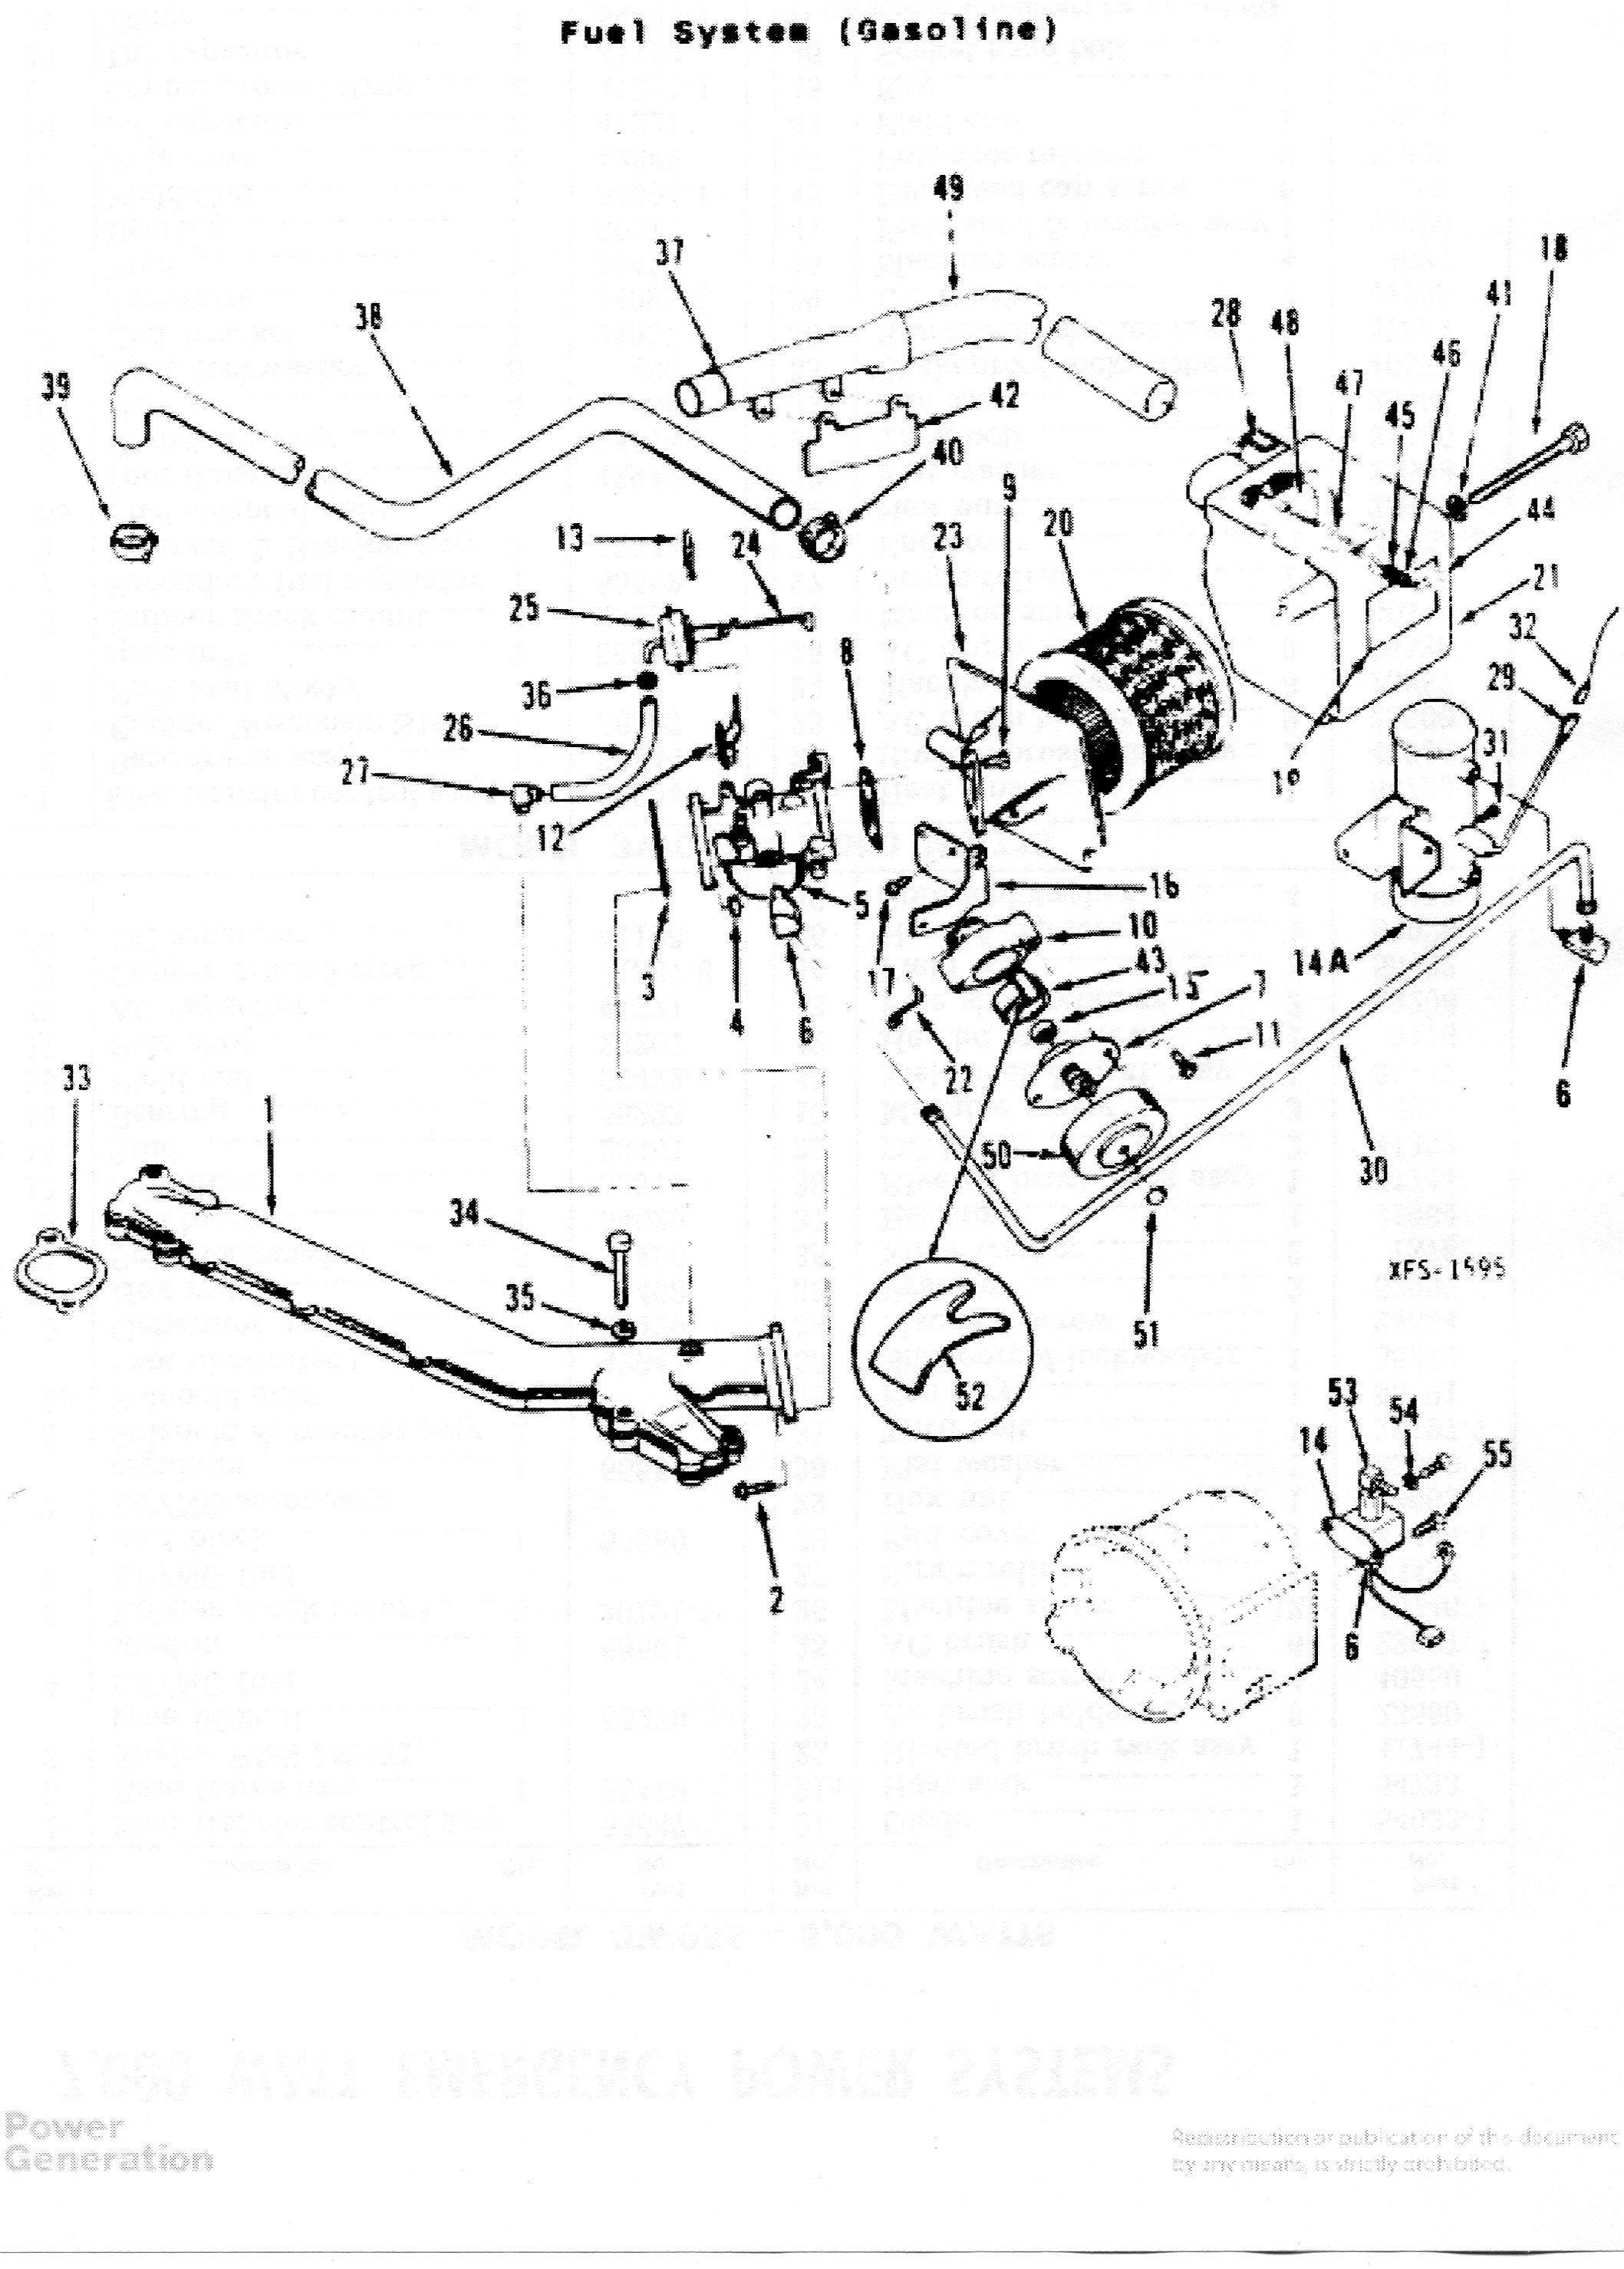 Onan 7 5 Mdje Wiring Diagram